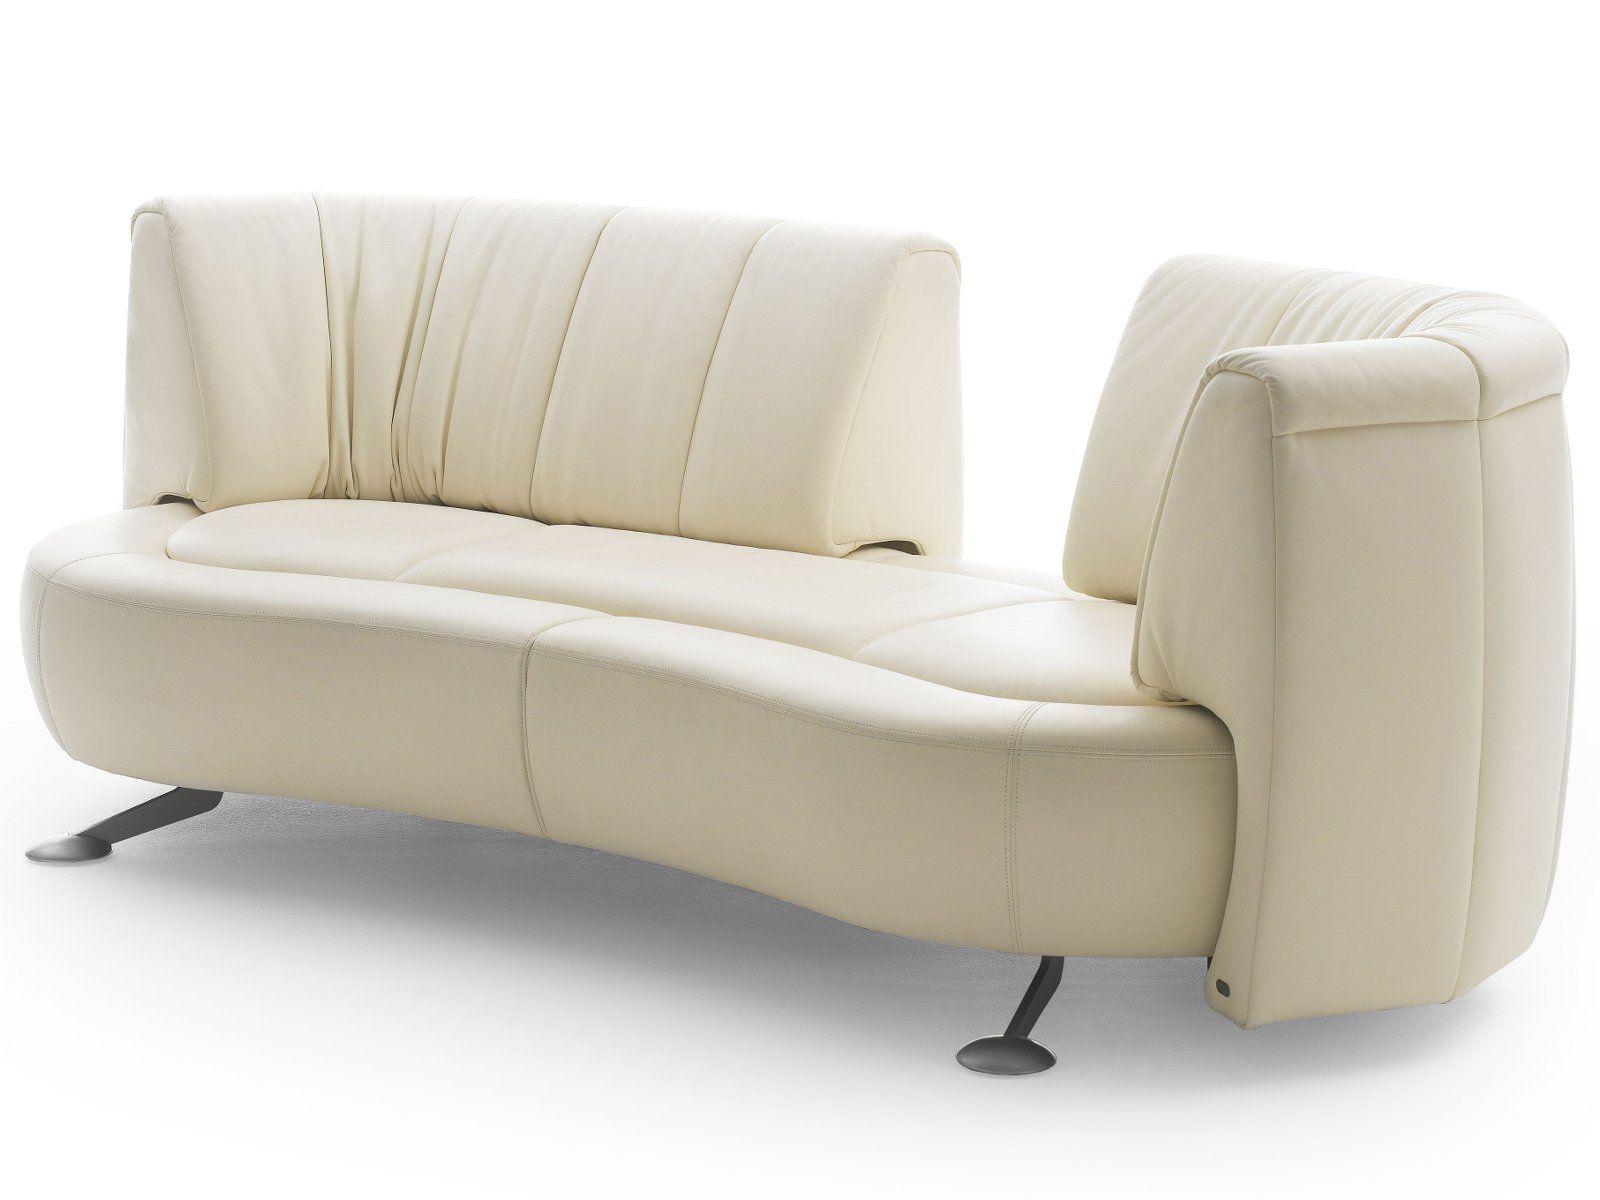 ds 164 sofa by de sede design hugo de ruiter. Black Bedroom Furniture Sets. Home Design Ideas